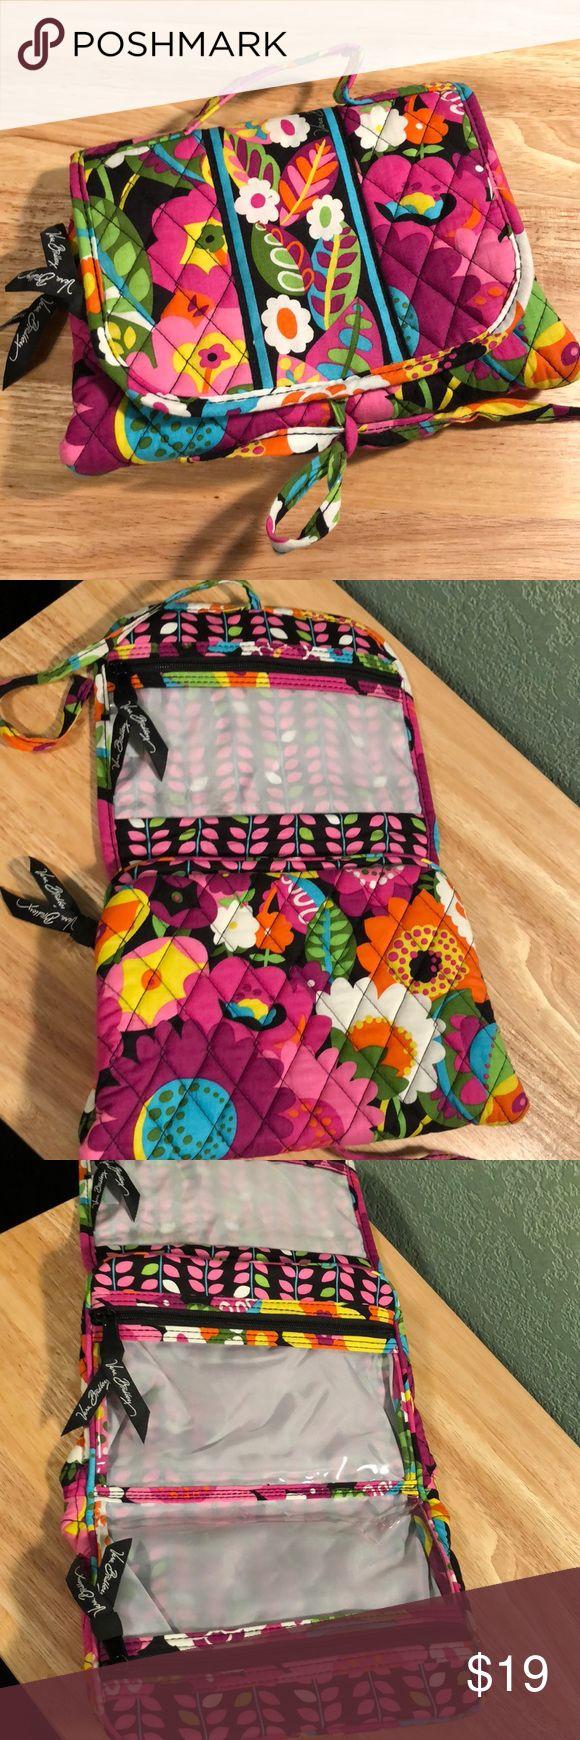 "Vera Bradley travel case Pretty floral Vera B. cosmetic travel bag, 9""W x 7""H x 1-1/2""D (when closed), hardly used...EUC! Vera Bradley Bags Cosmetic Bags & Cases"